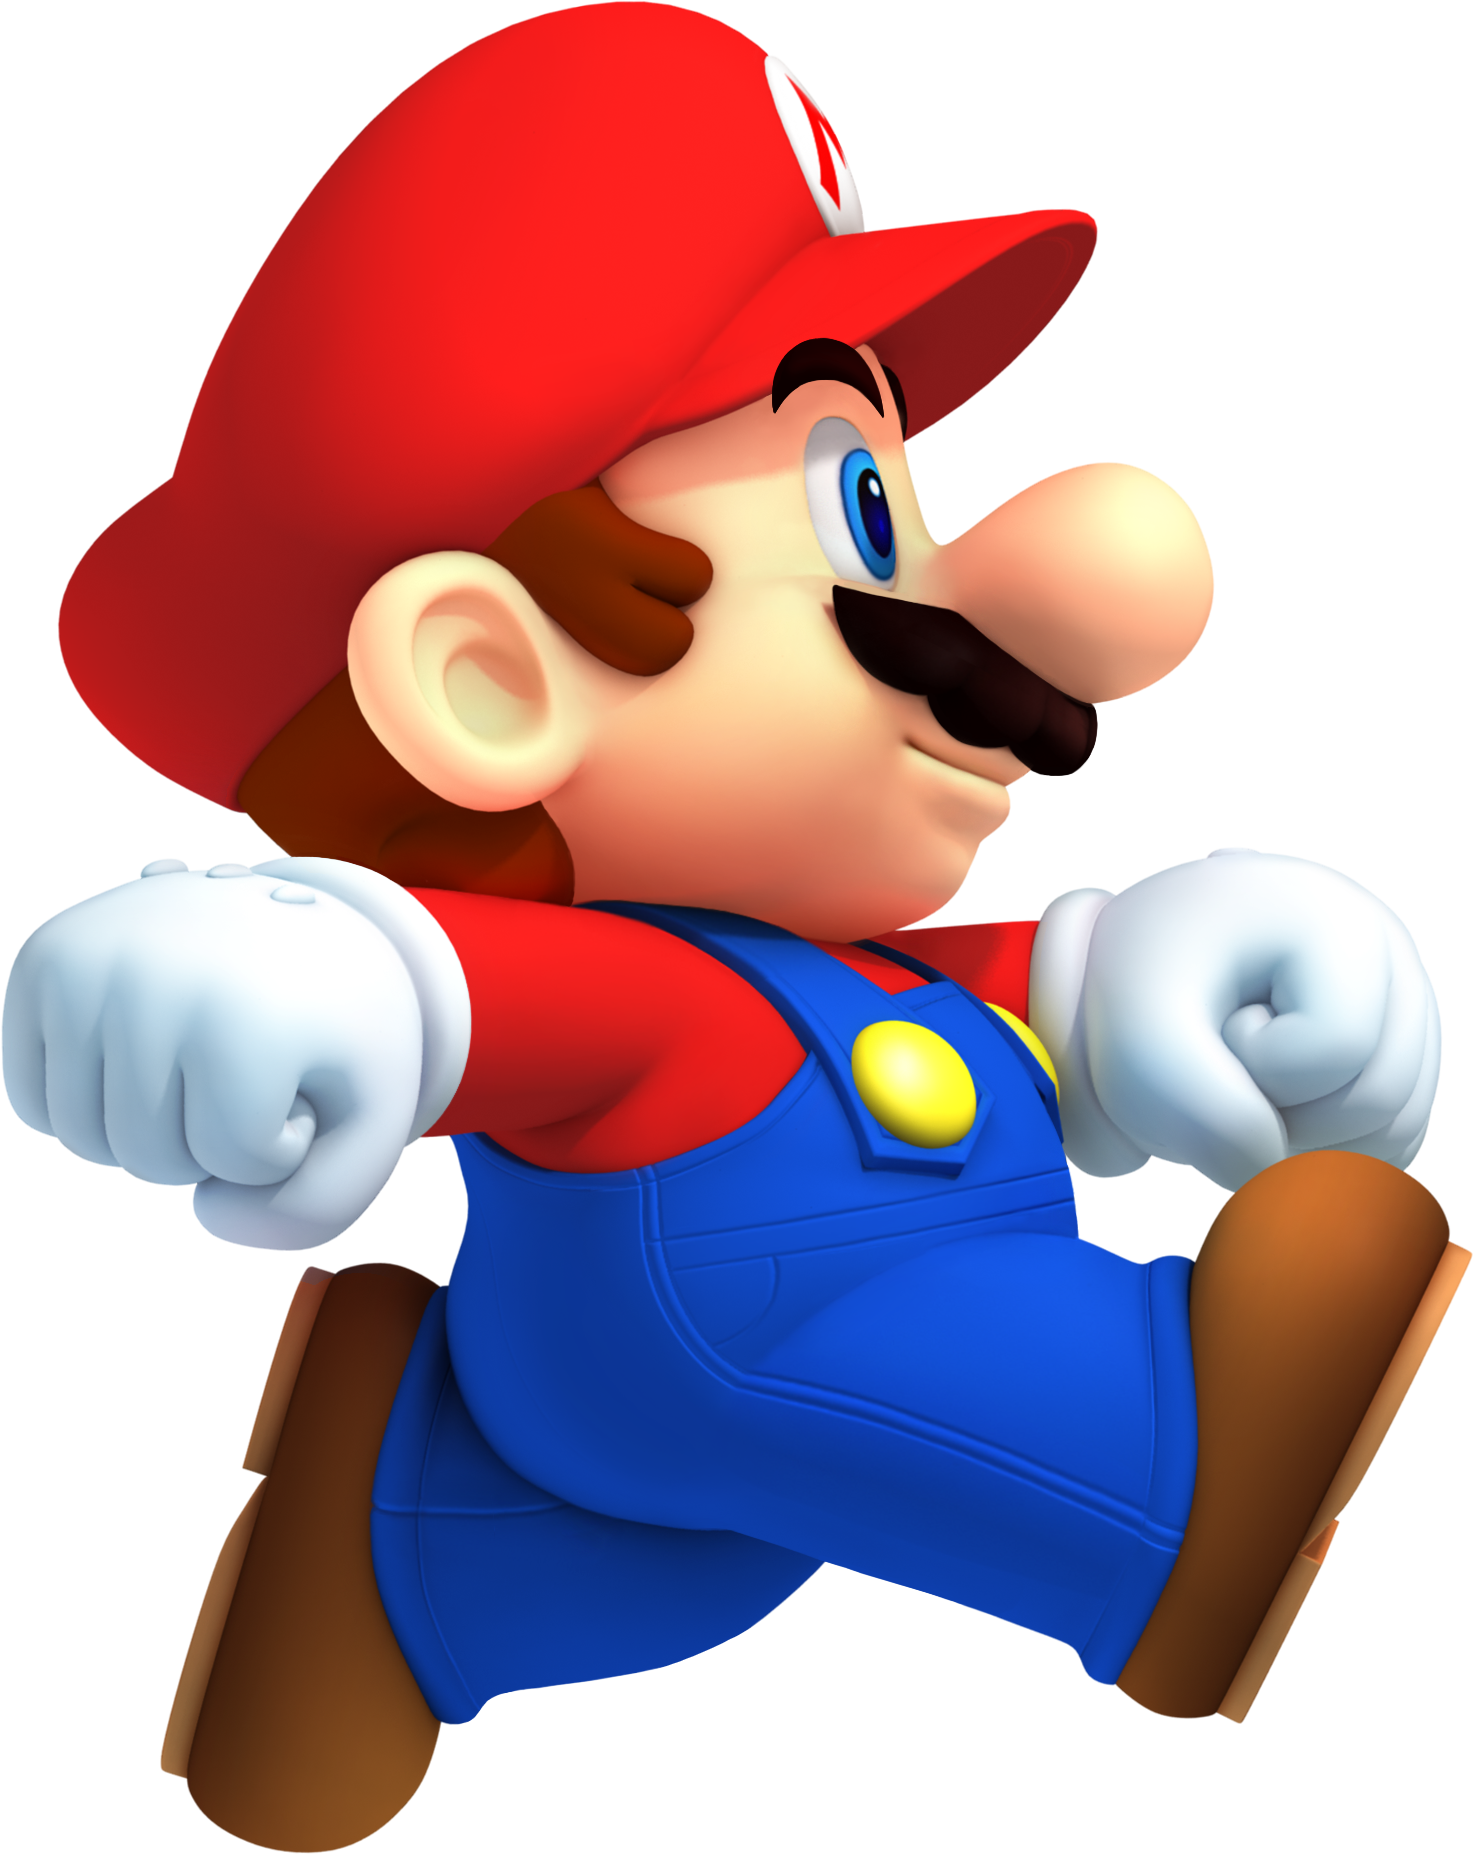 Pin By Udash On Testing A Board With A Long Title Super Mario Bros Party Mario Bros Mini Mario